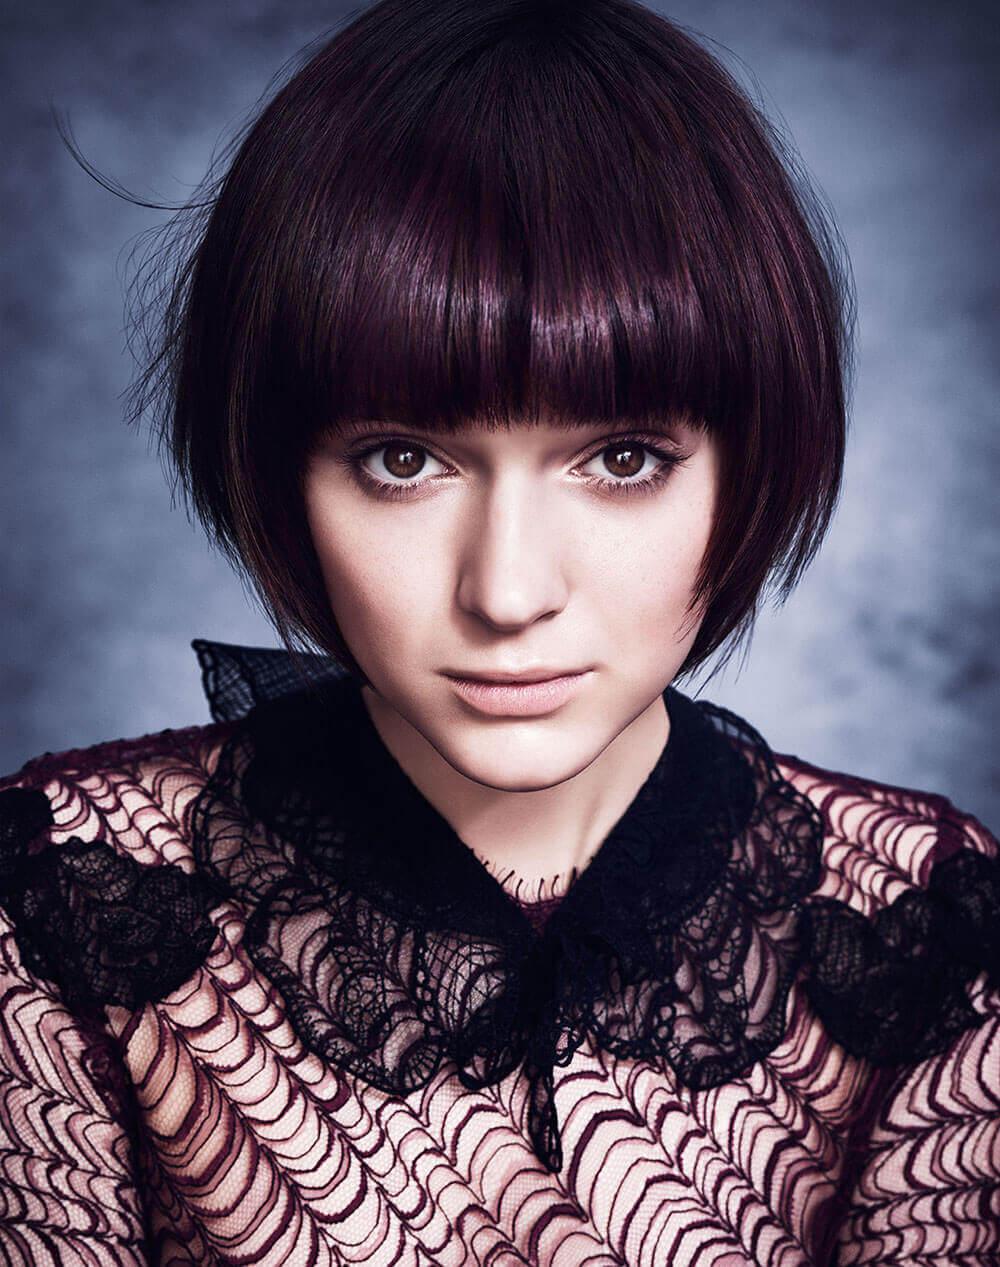 Cut & Blow Dry Hair Styling - Hair Salon | Kaplan Atelier - Holland Park Avenue, London